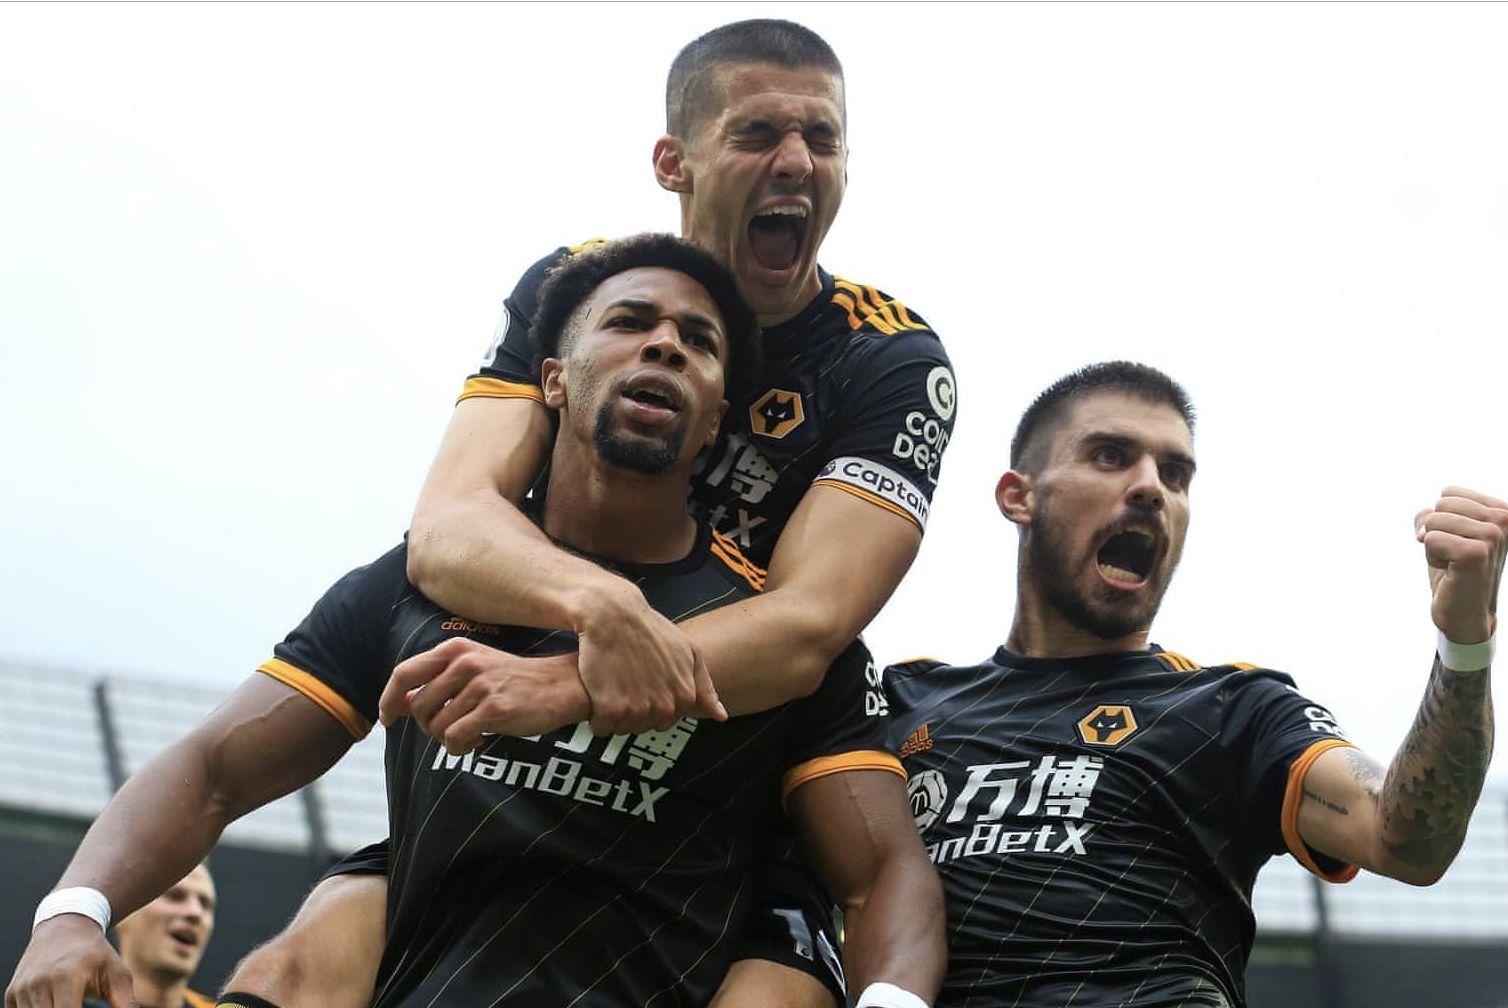 20191006 Manchester City 0 2 Wolverhampton Adama Traore Wolverhampton Premier League Manchester City